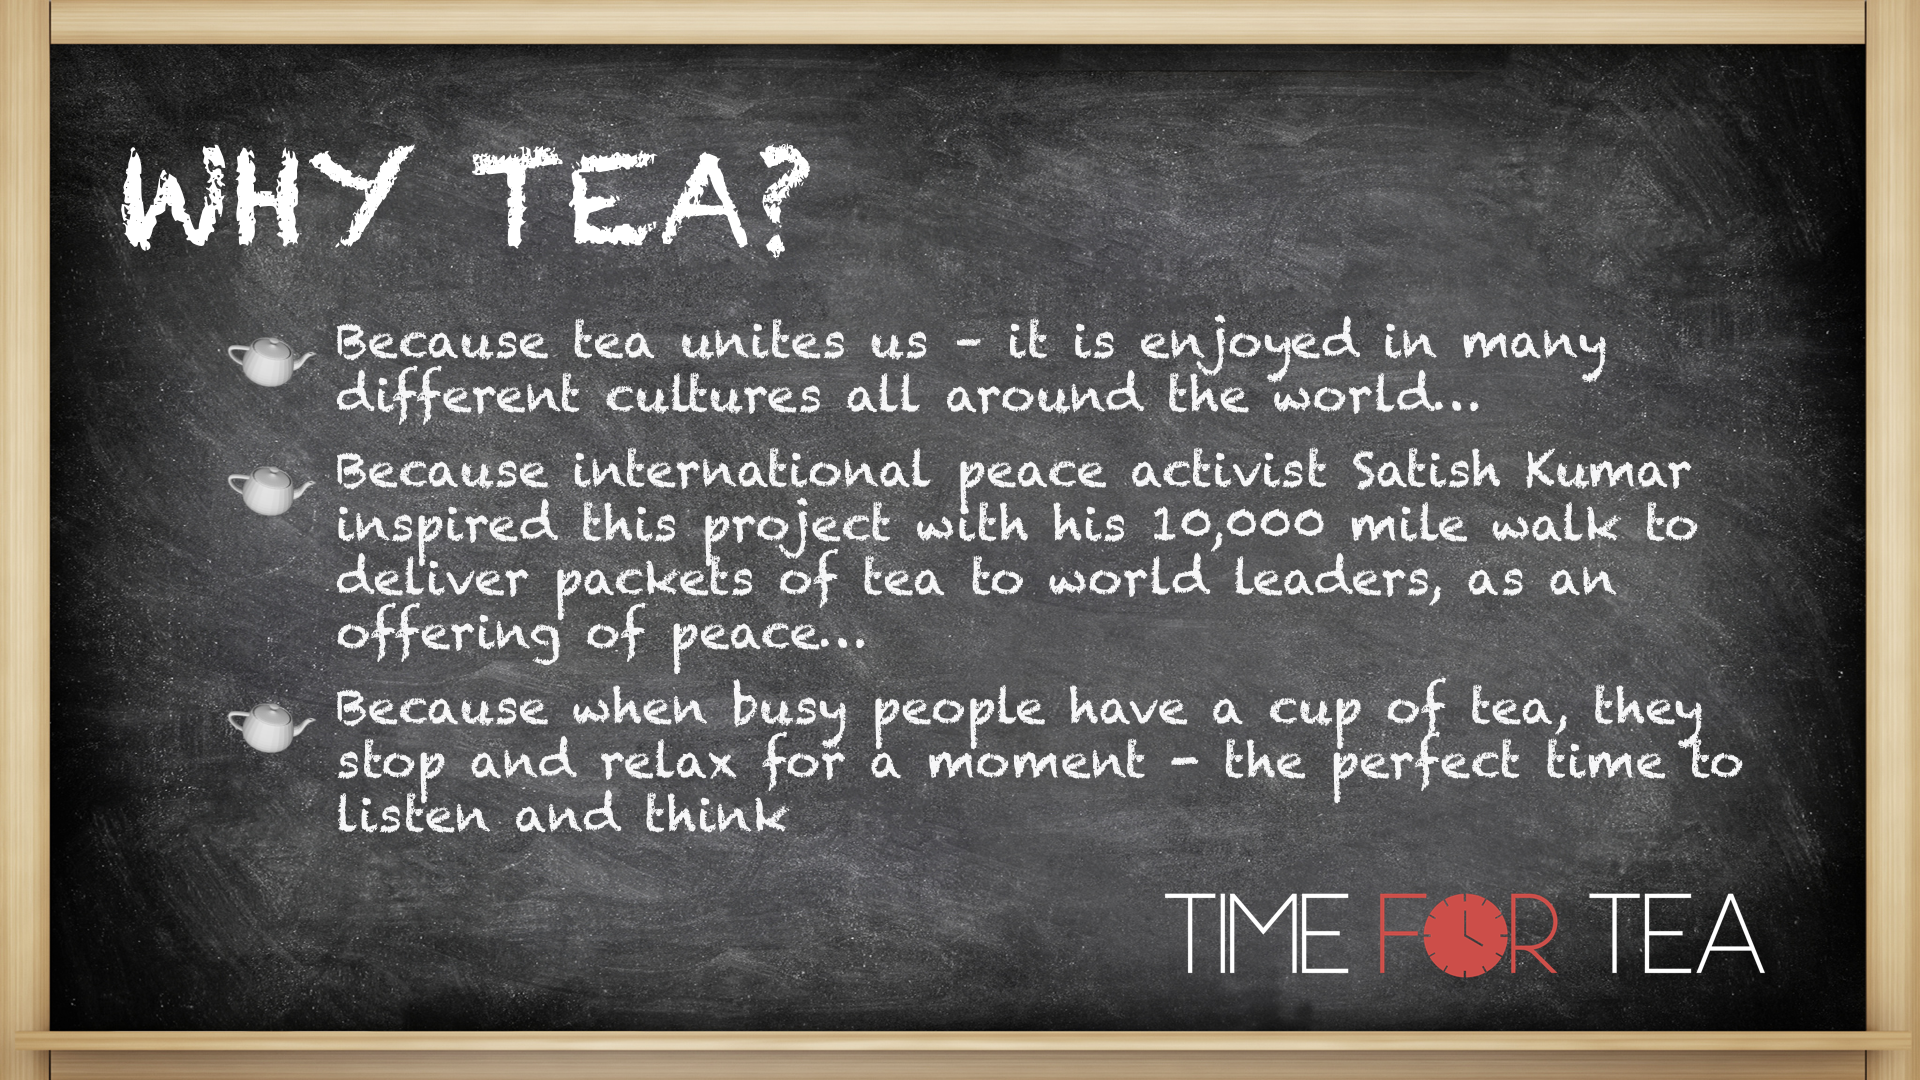 Time for tea 2017 Keynote Static v3.003